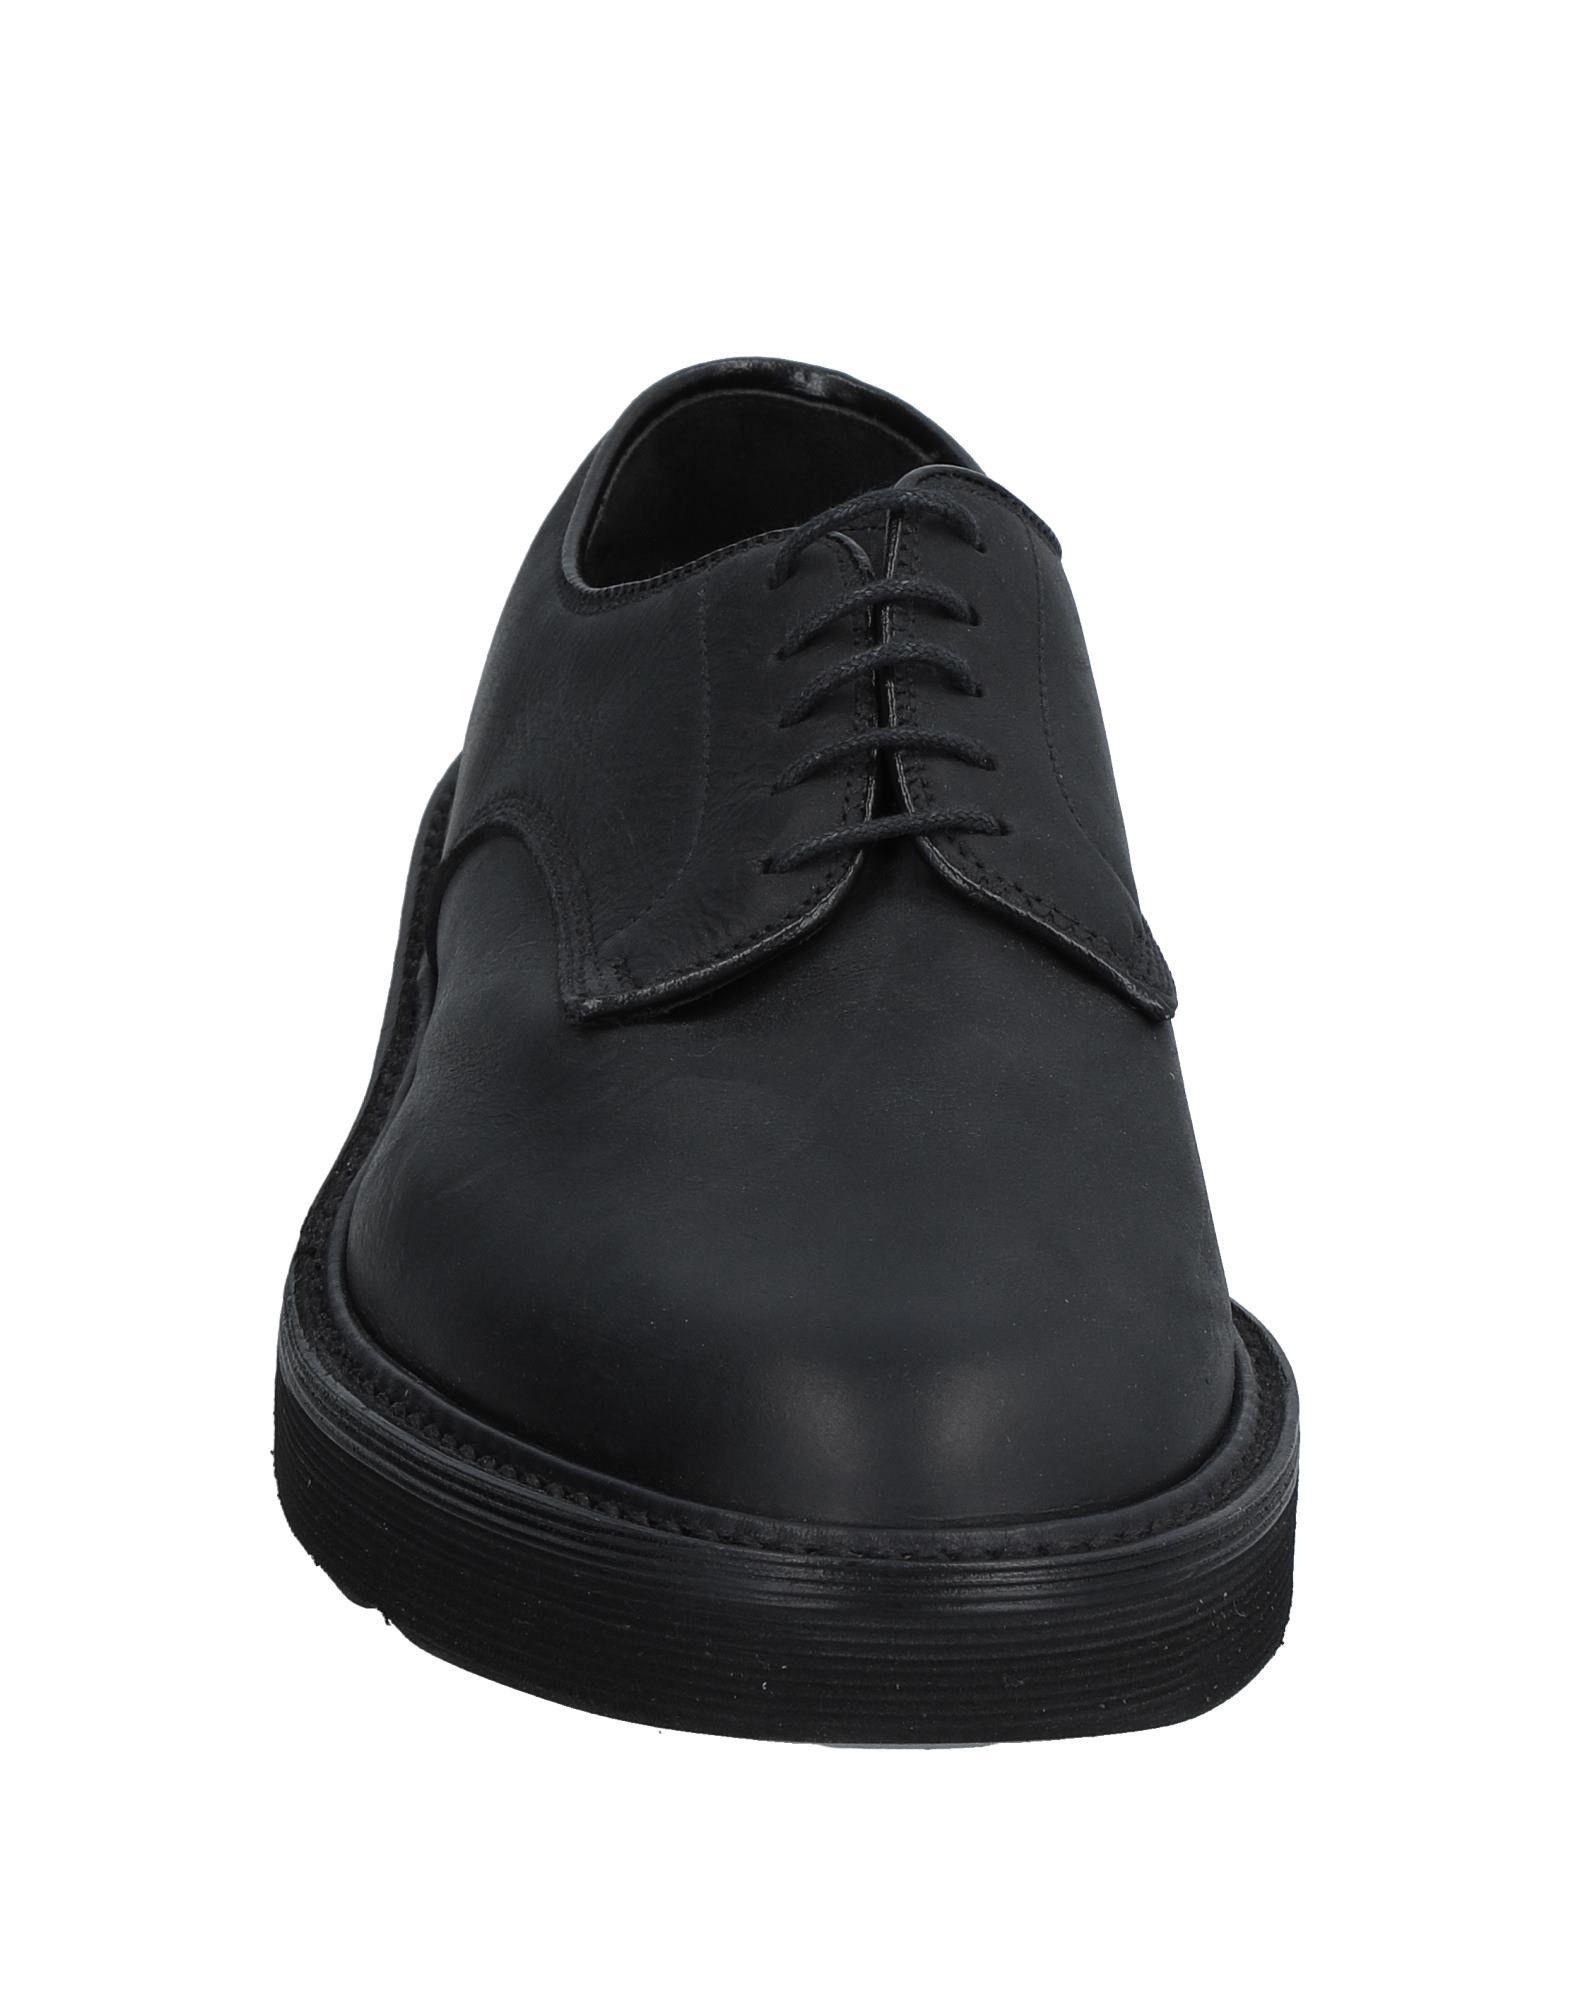 Premiata Schnürschuhe Herren  11531150MW Heiße Schuhe 879283